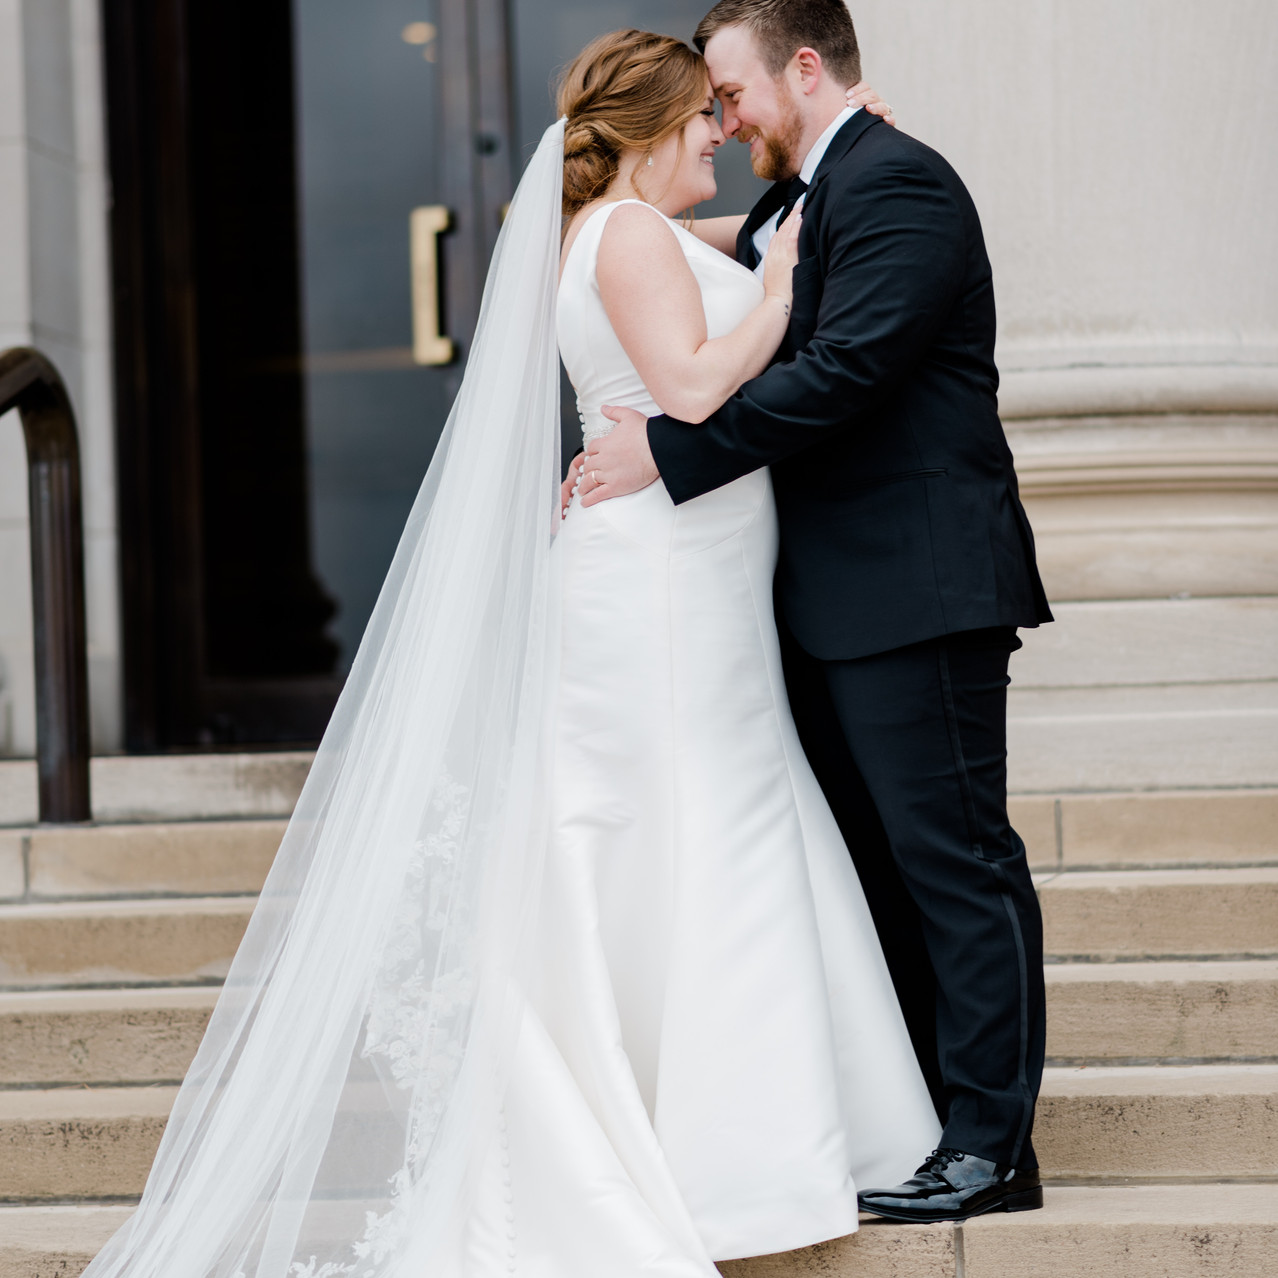 St. Louis Wedding Photographer & St. Louis Wedding Videographer